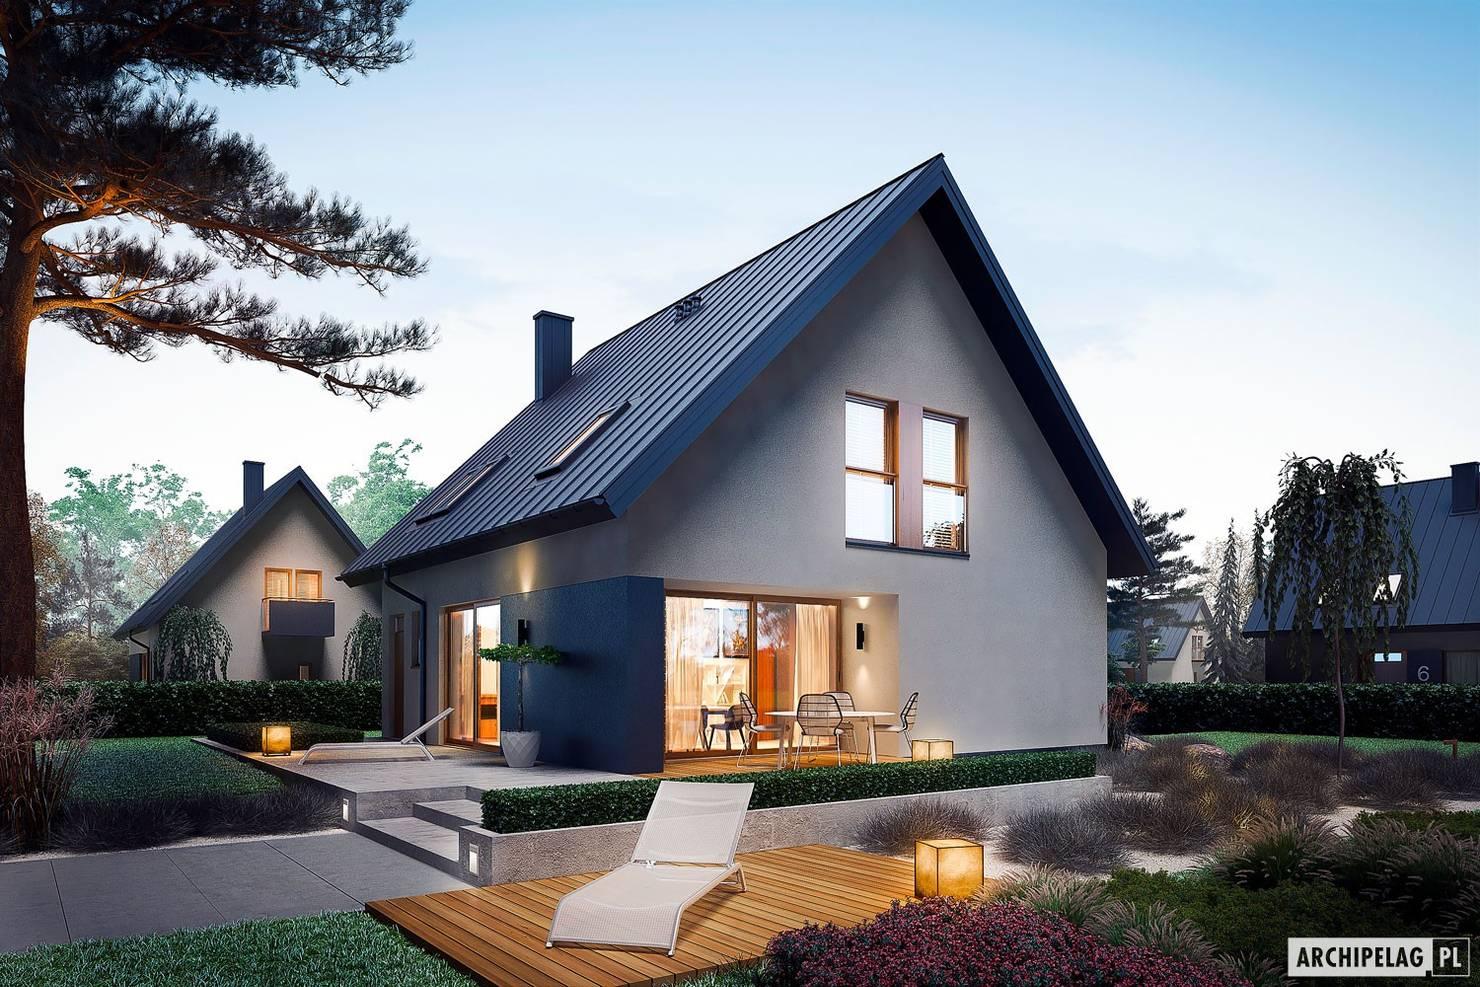 Проект недорого мансардного дома за 4,5 млн рублей- фотографии